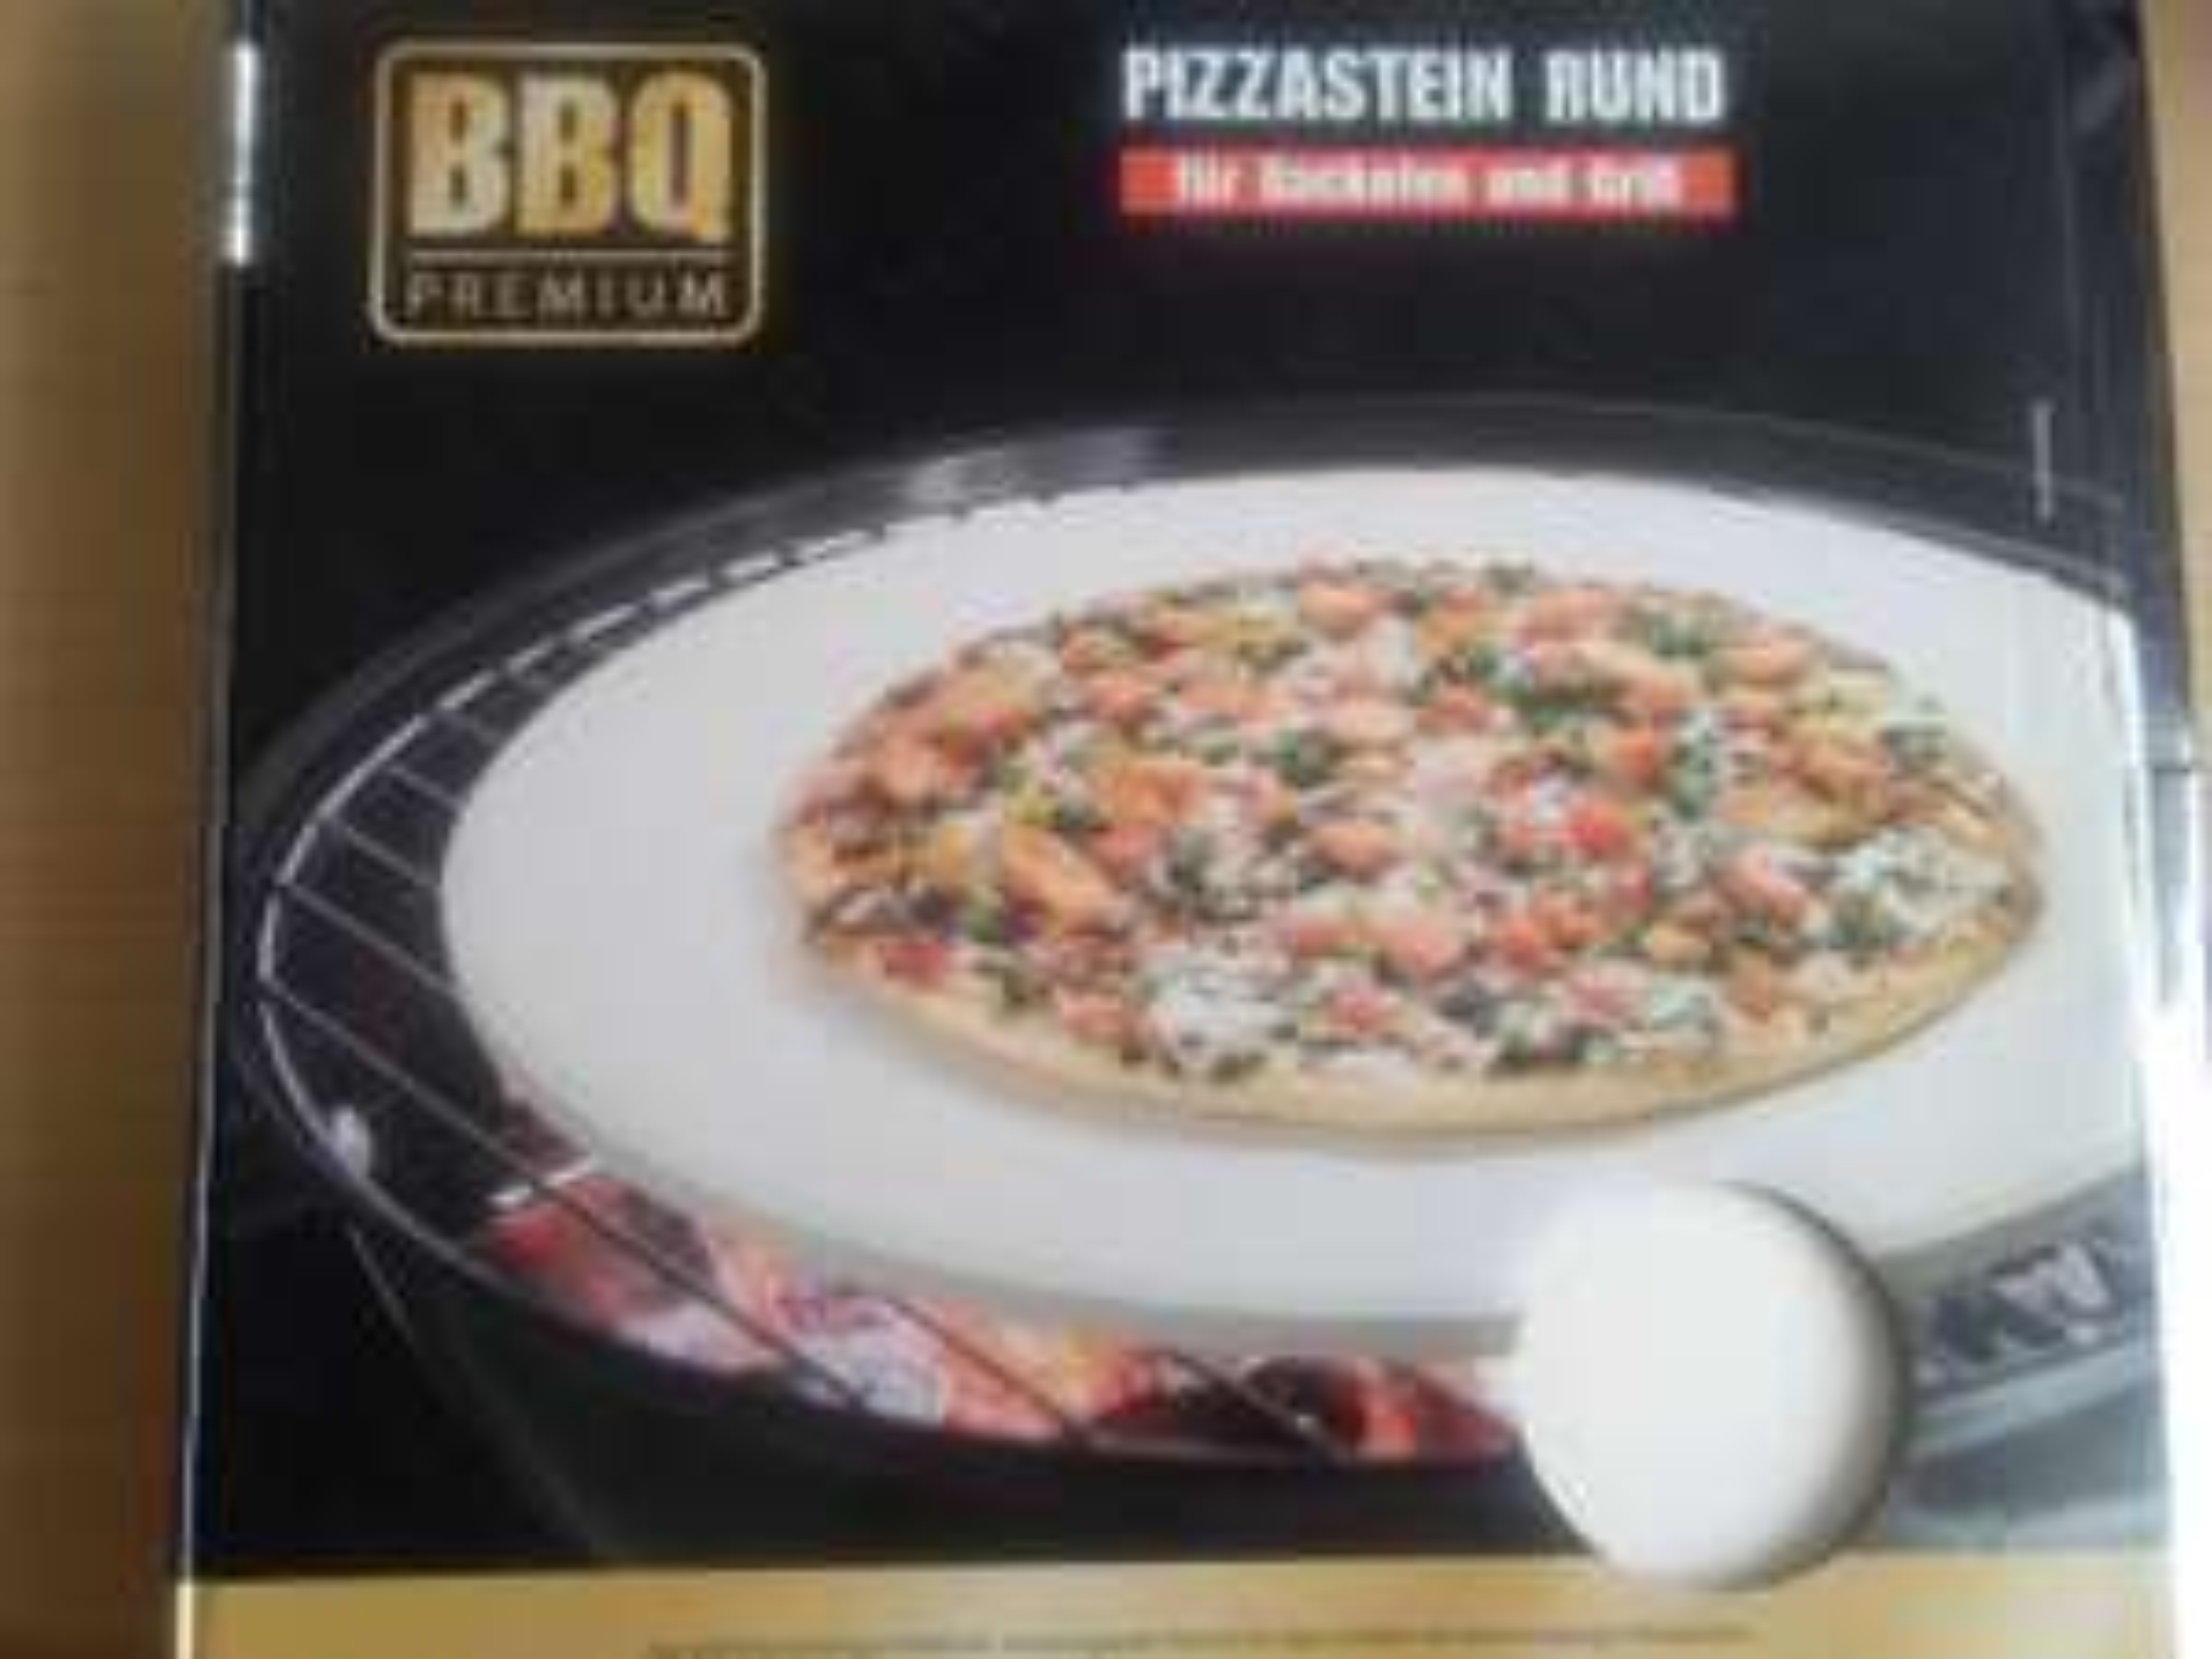 BBQ Premium Pizzastein Aldi Süd Troisdorf [ Lokal ? ]